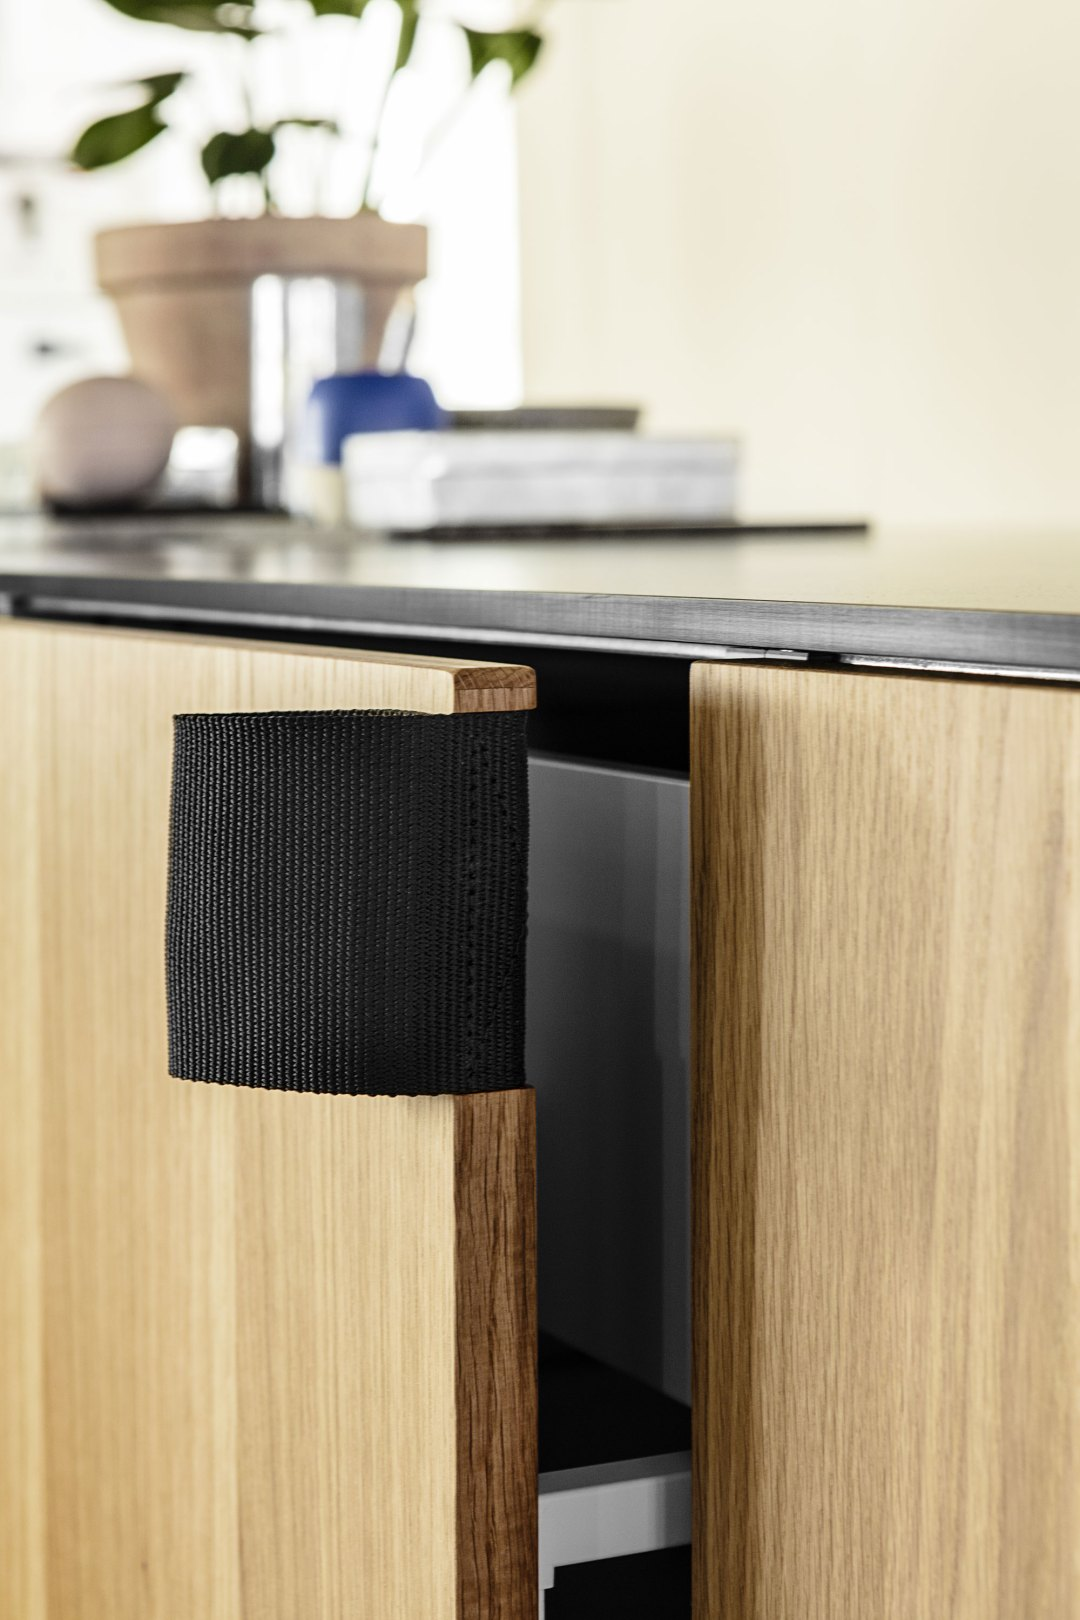 BIG kitchen designed by Bjarke Ingels Group